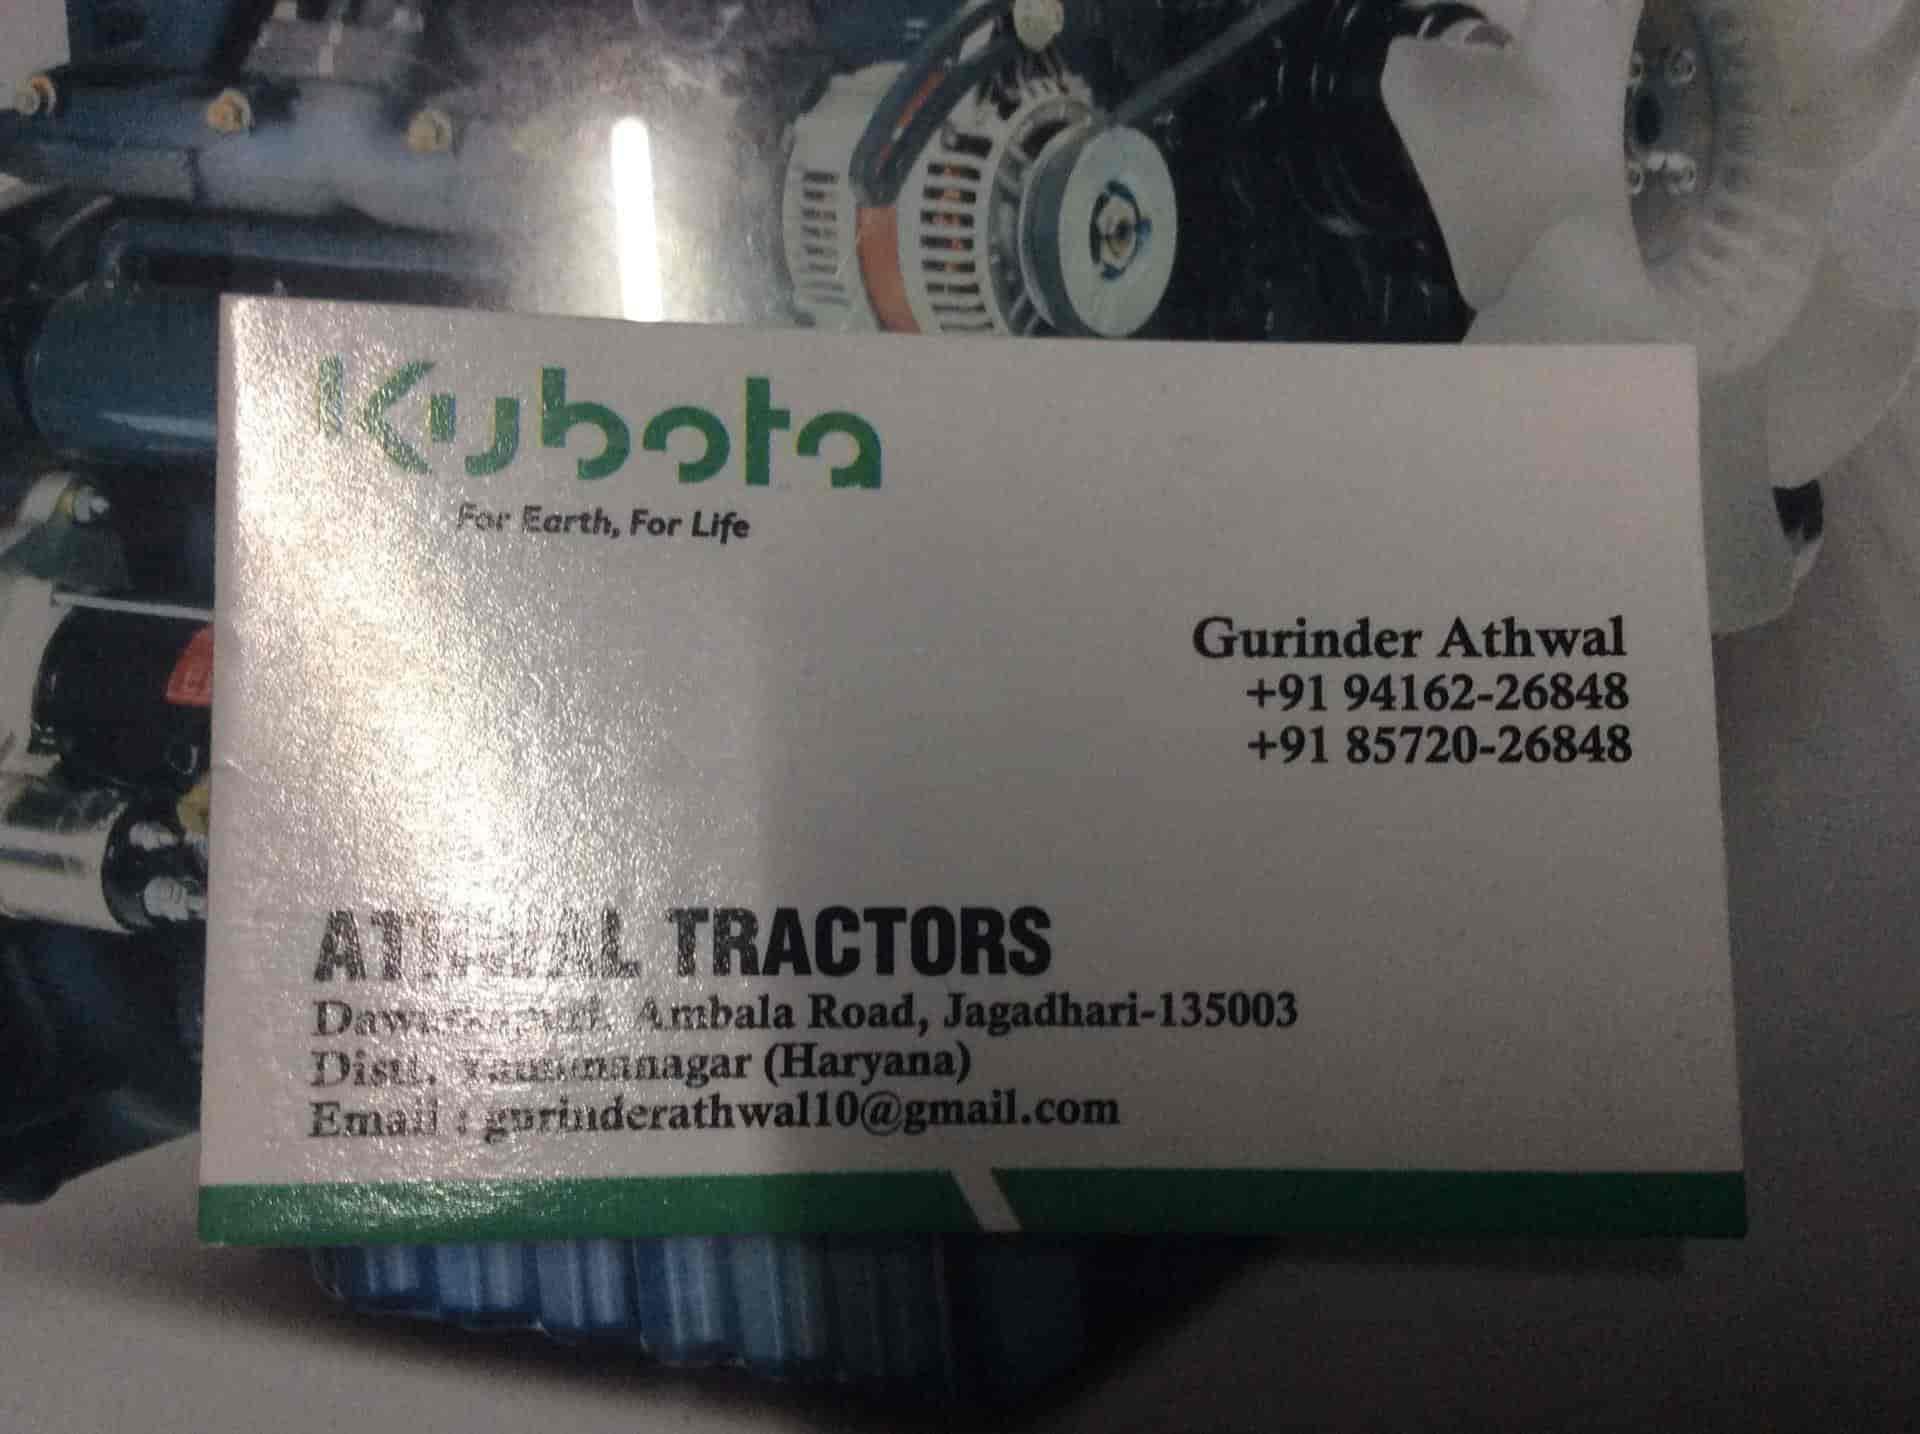 Athwal Tractors ( Kubota ), Jagadhri - Tractor Dealers in